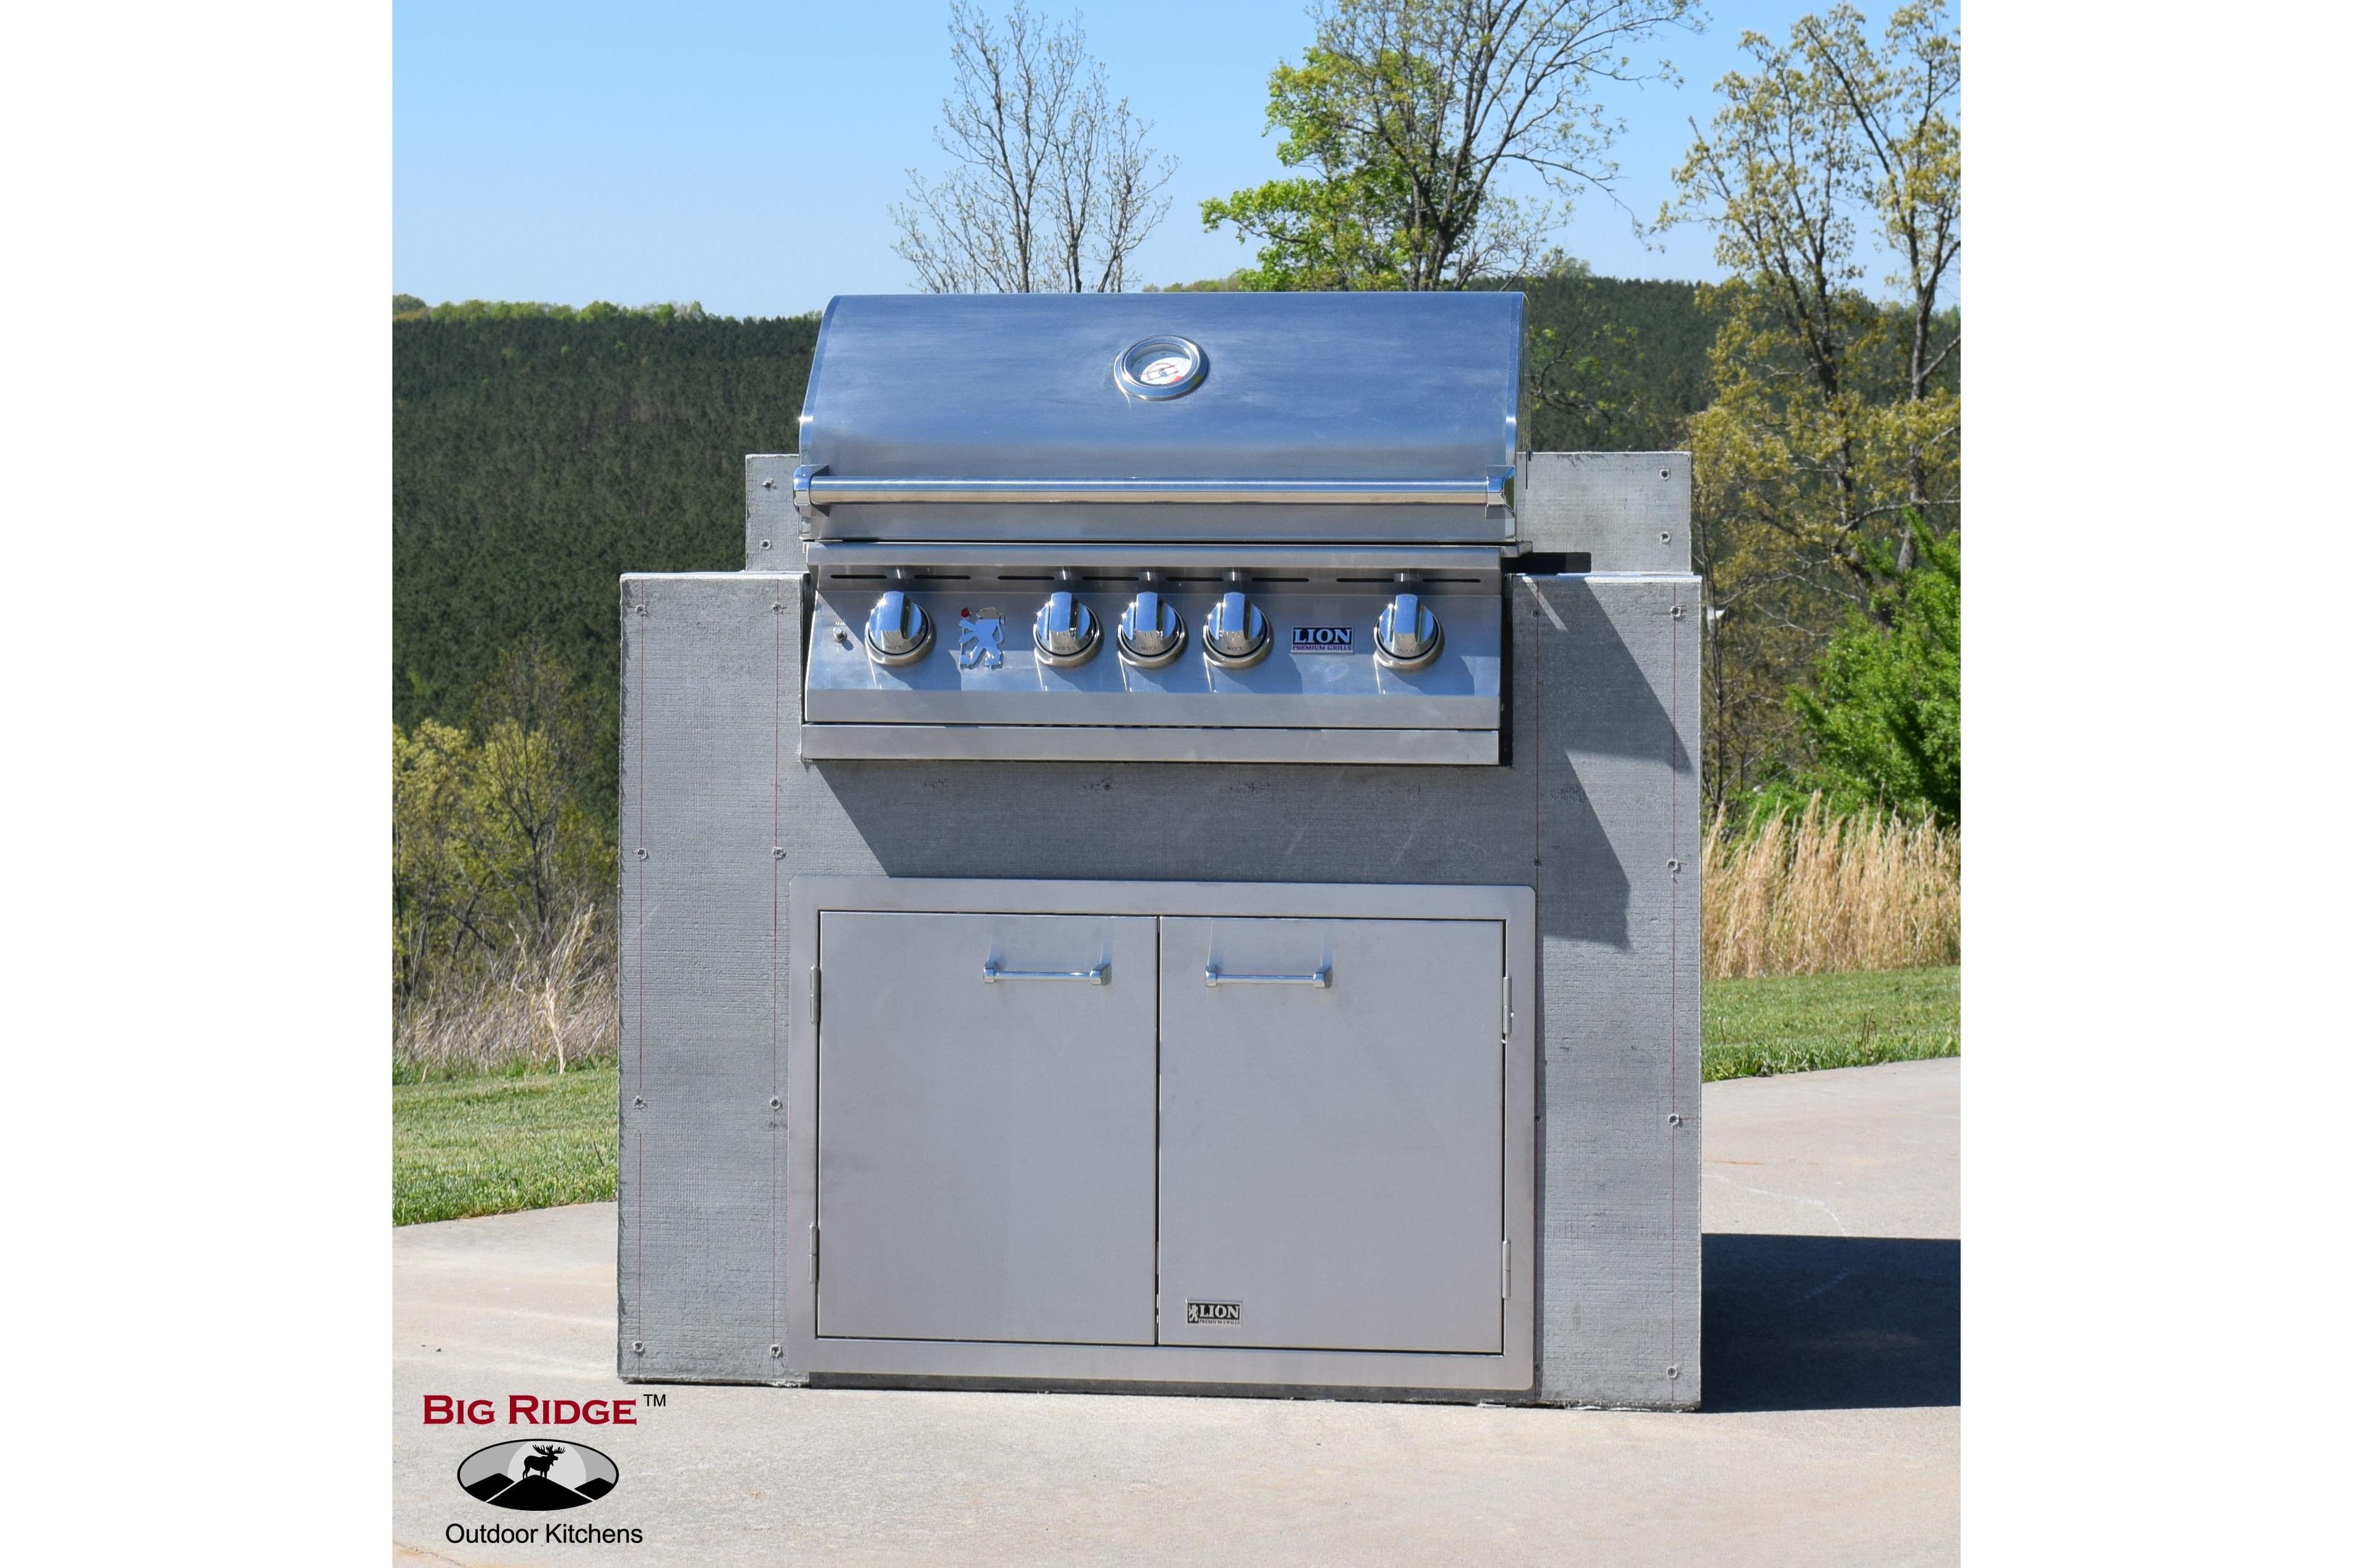 Big Ridge Outdoor Kitchens Outdoor Kitchen Modules Natural Gas Grill ...